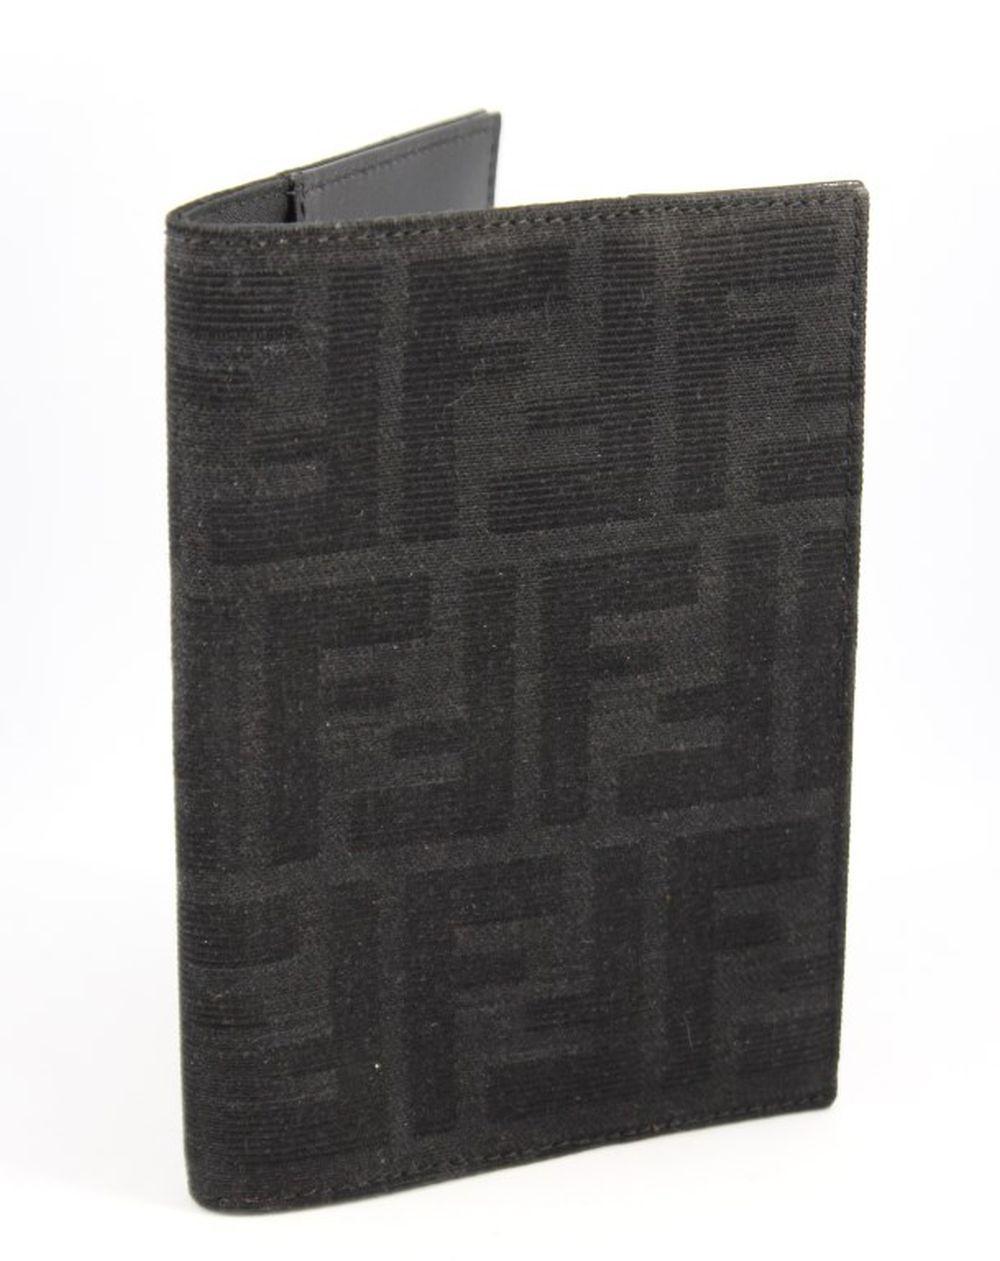 Fendi Monogram Zucca & Leather Passport Cover